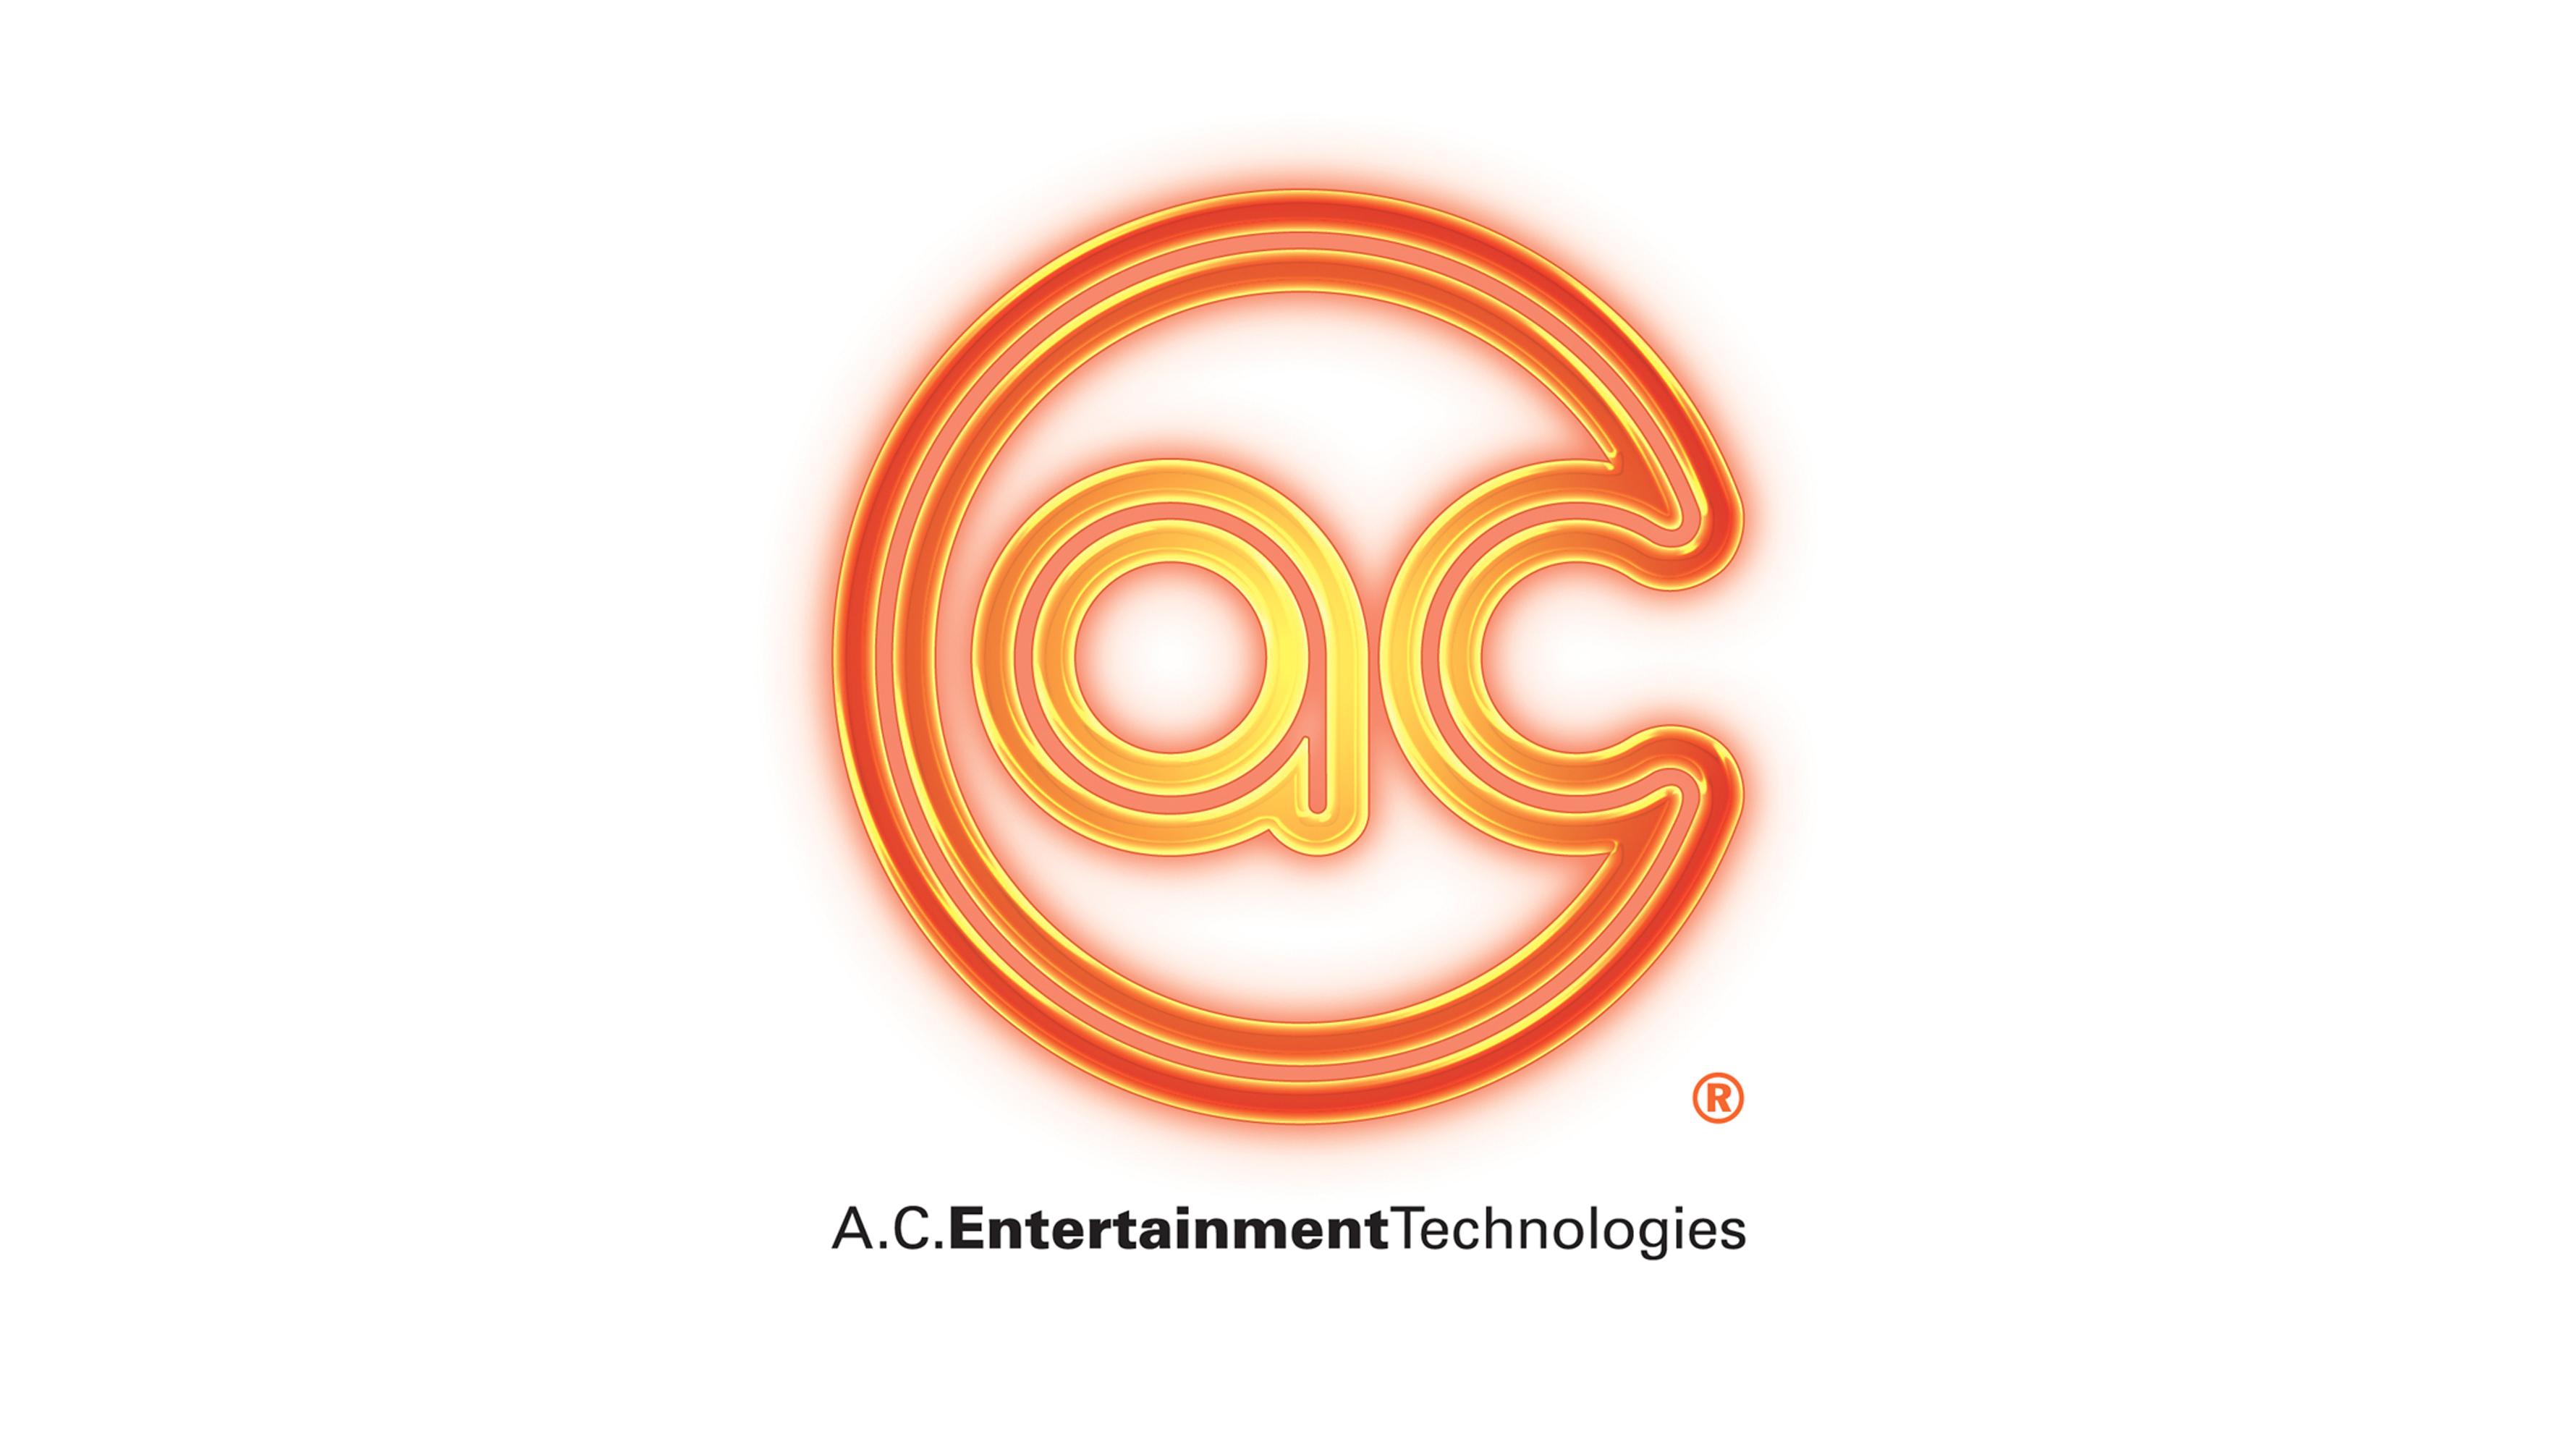 A.C. Entertainment Technologies